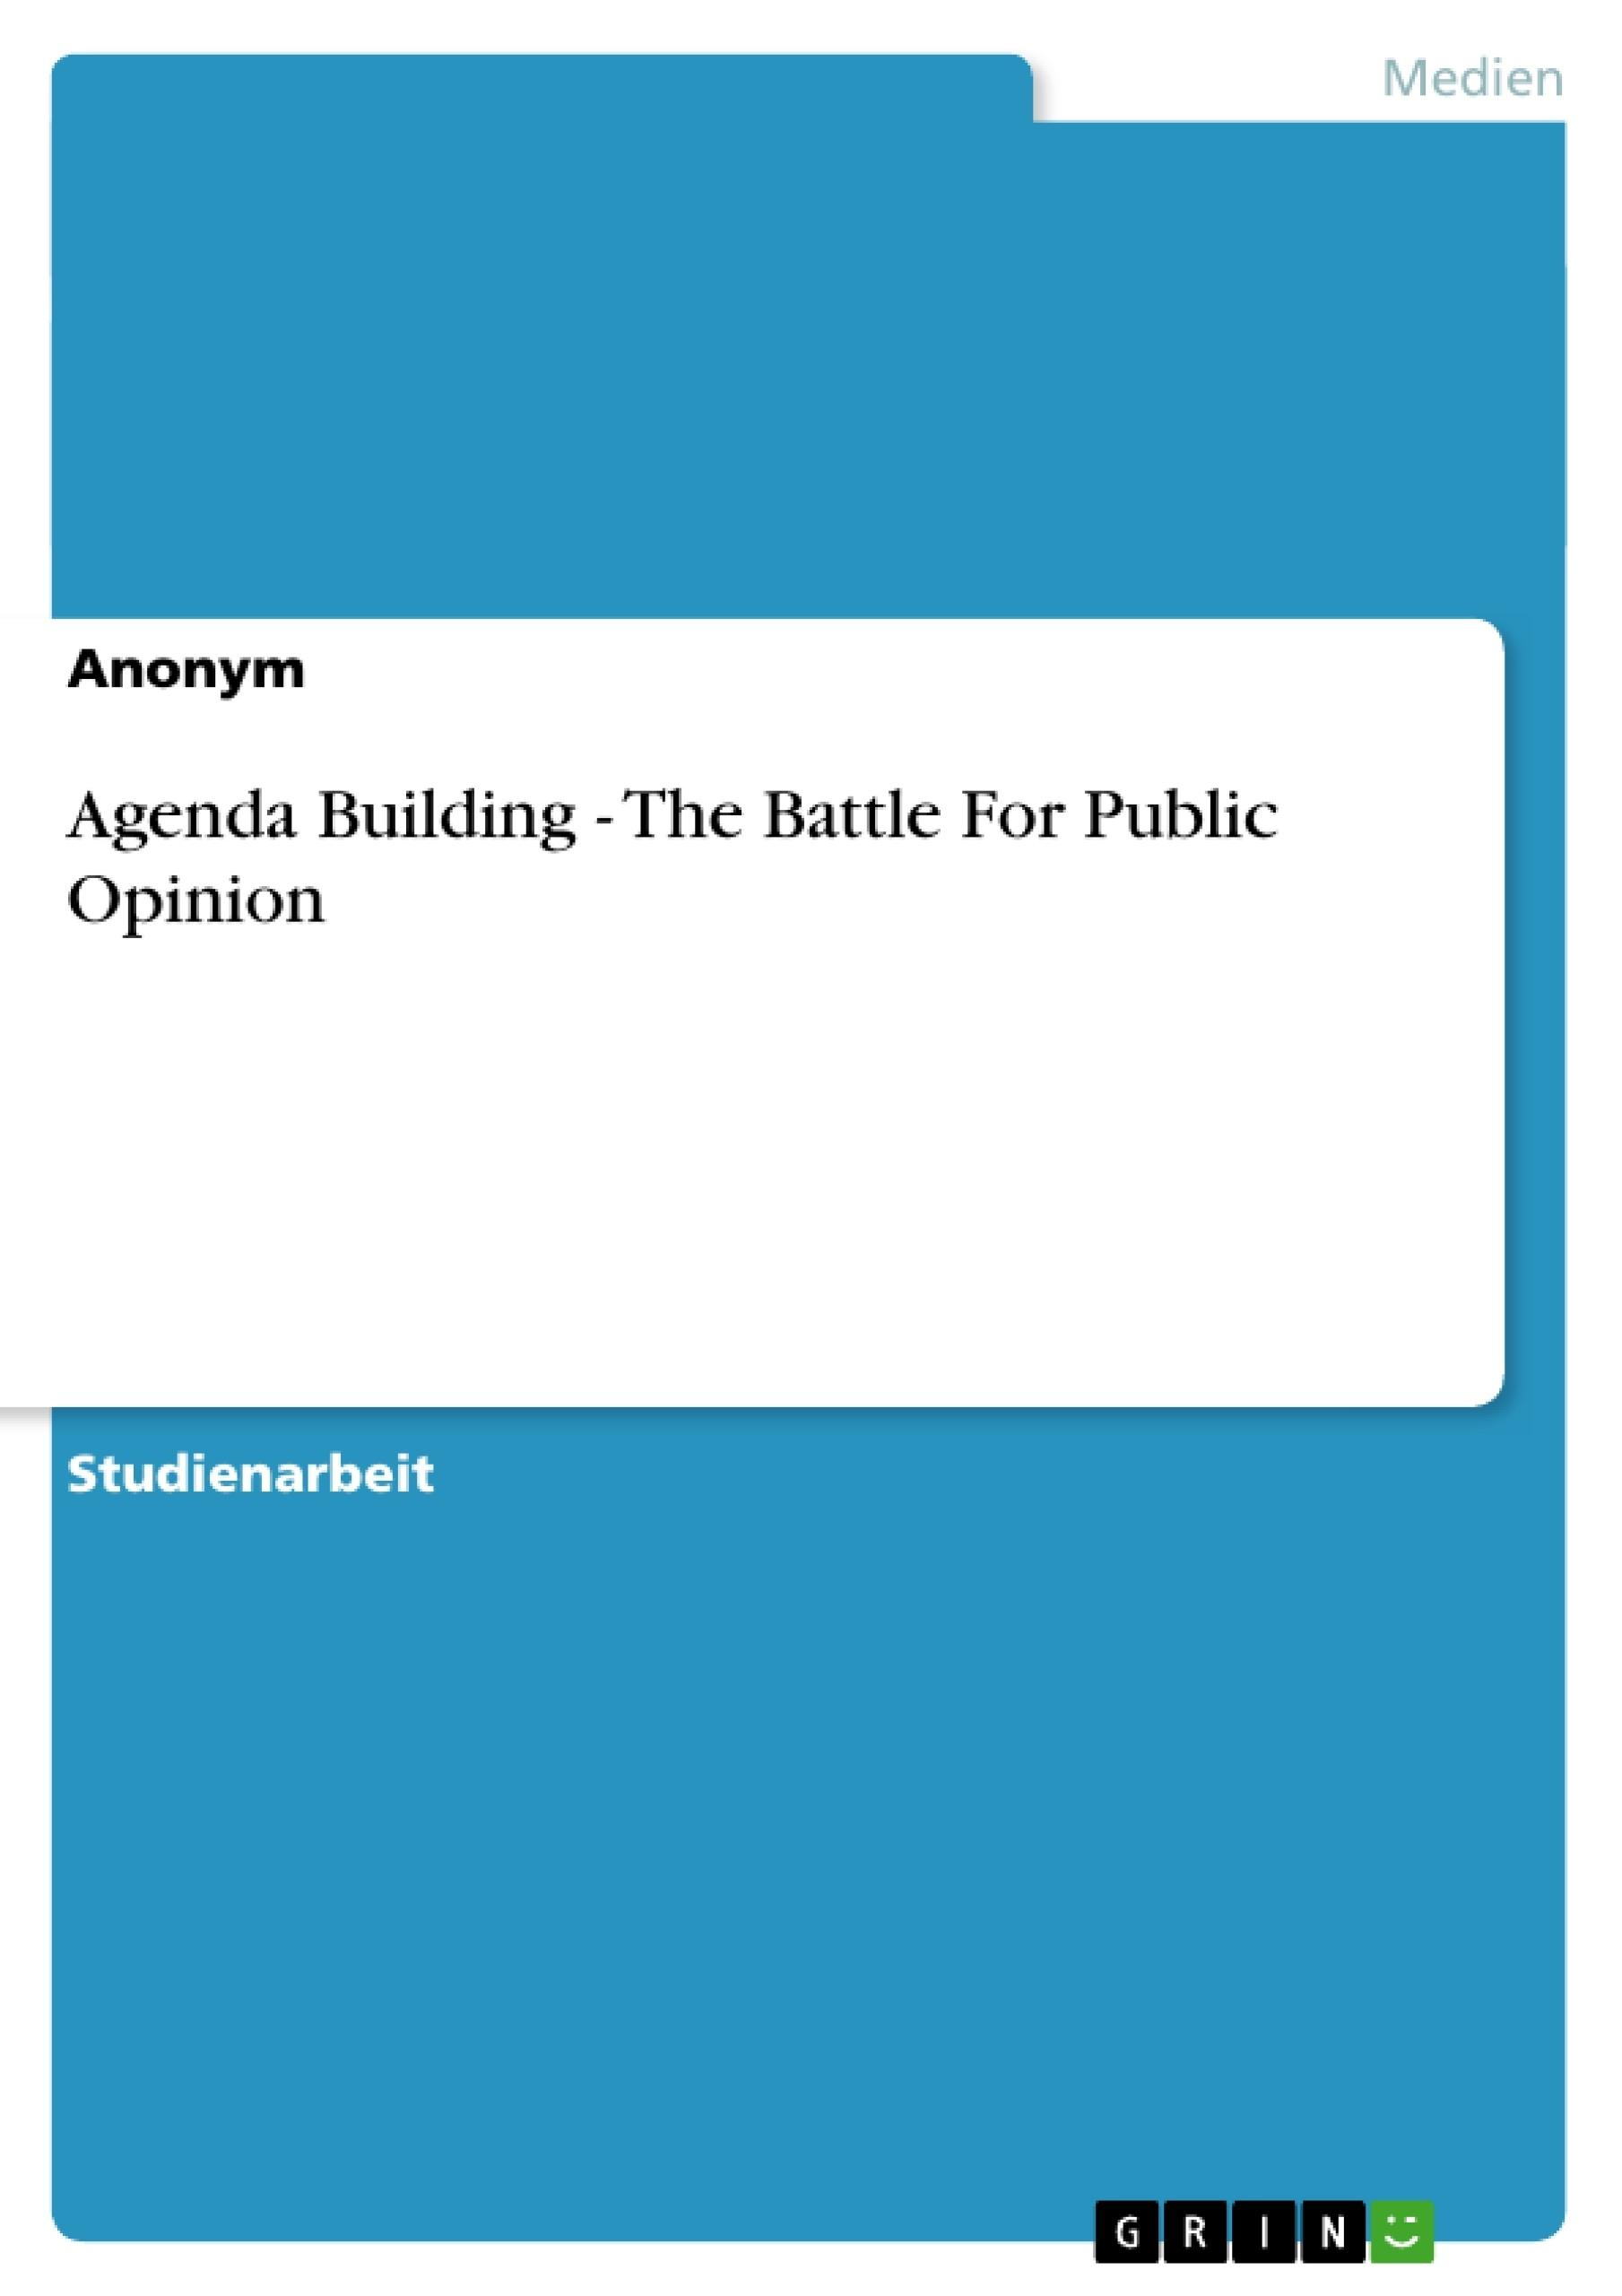 Titel: Agenda Building - The Battle For Public Opinion